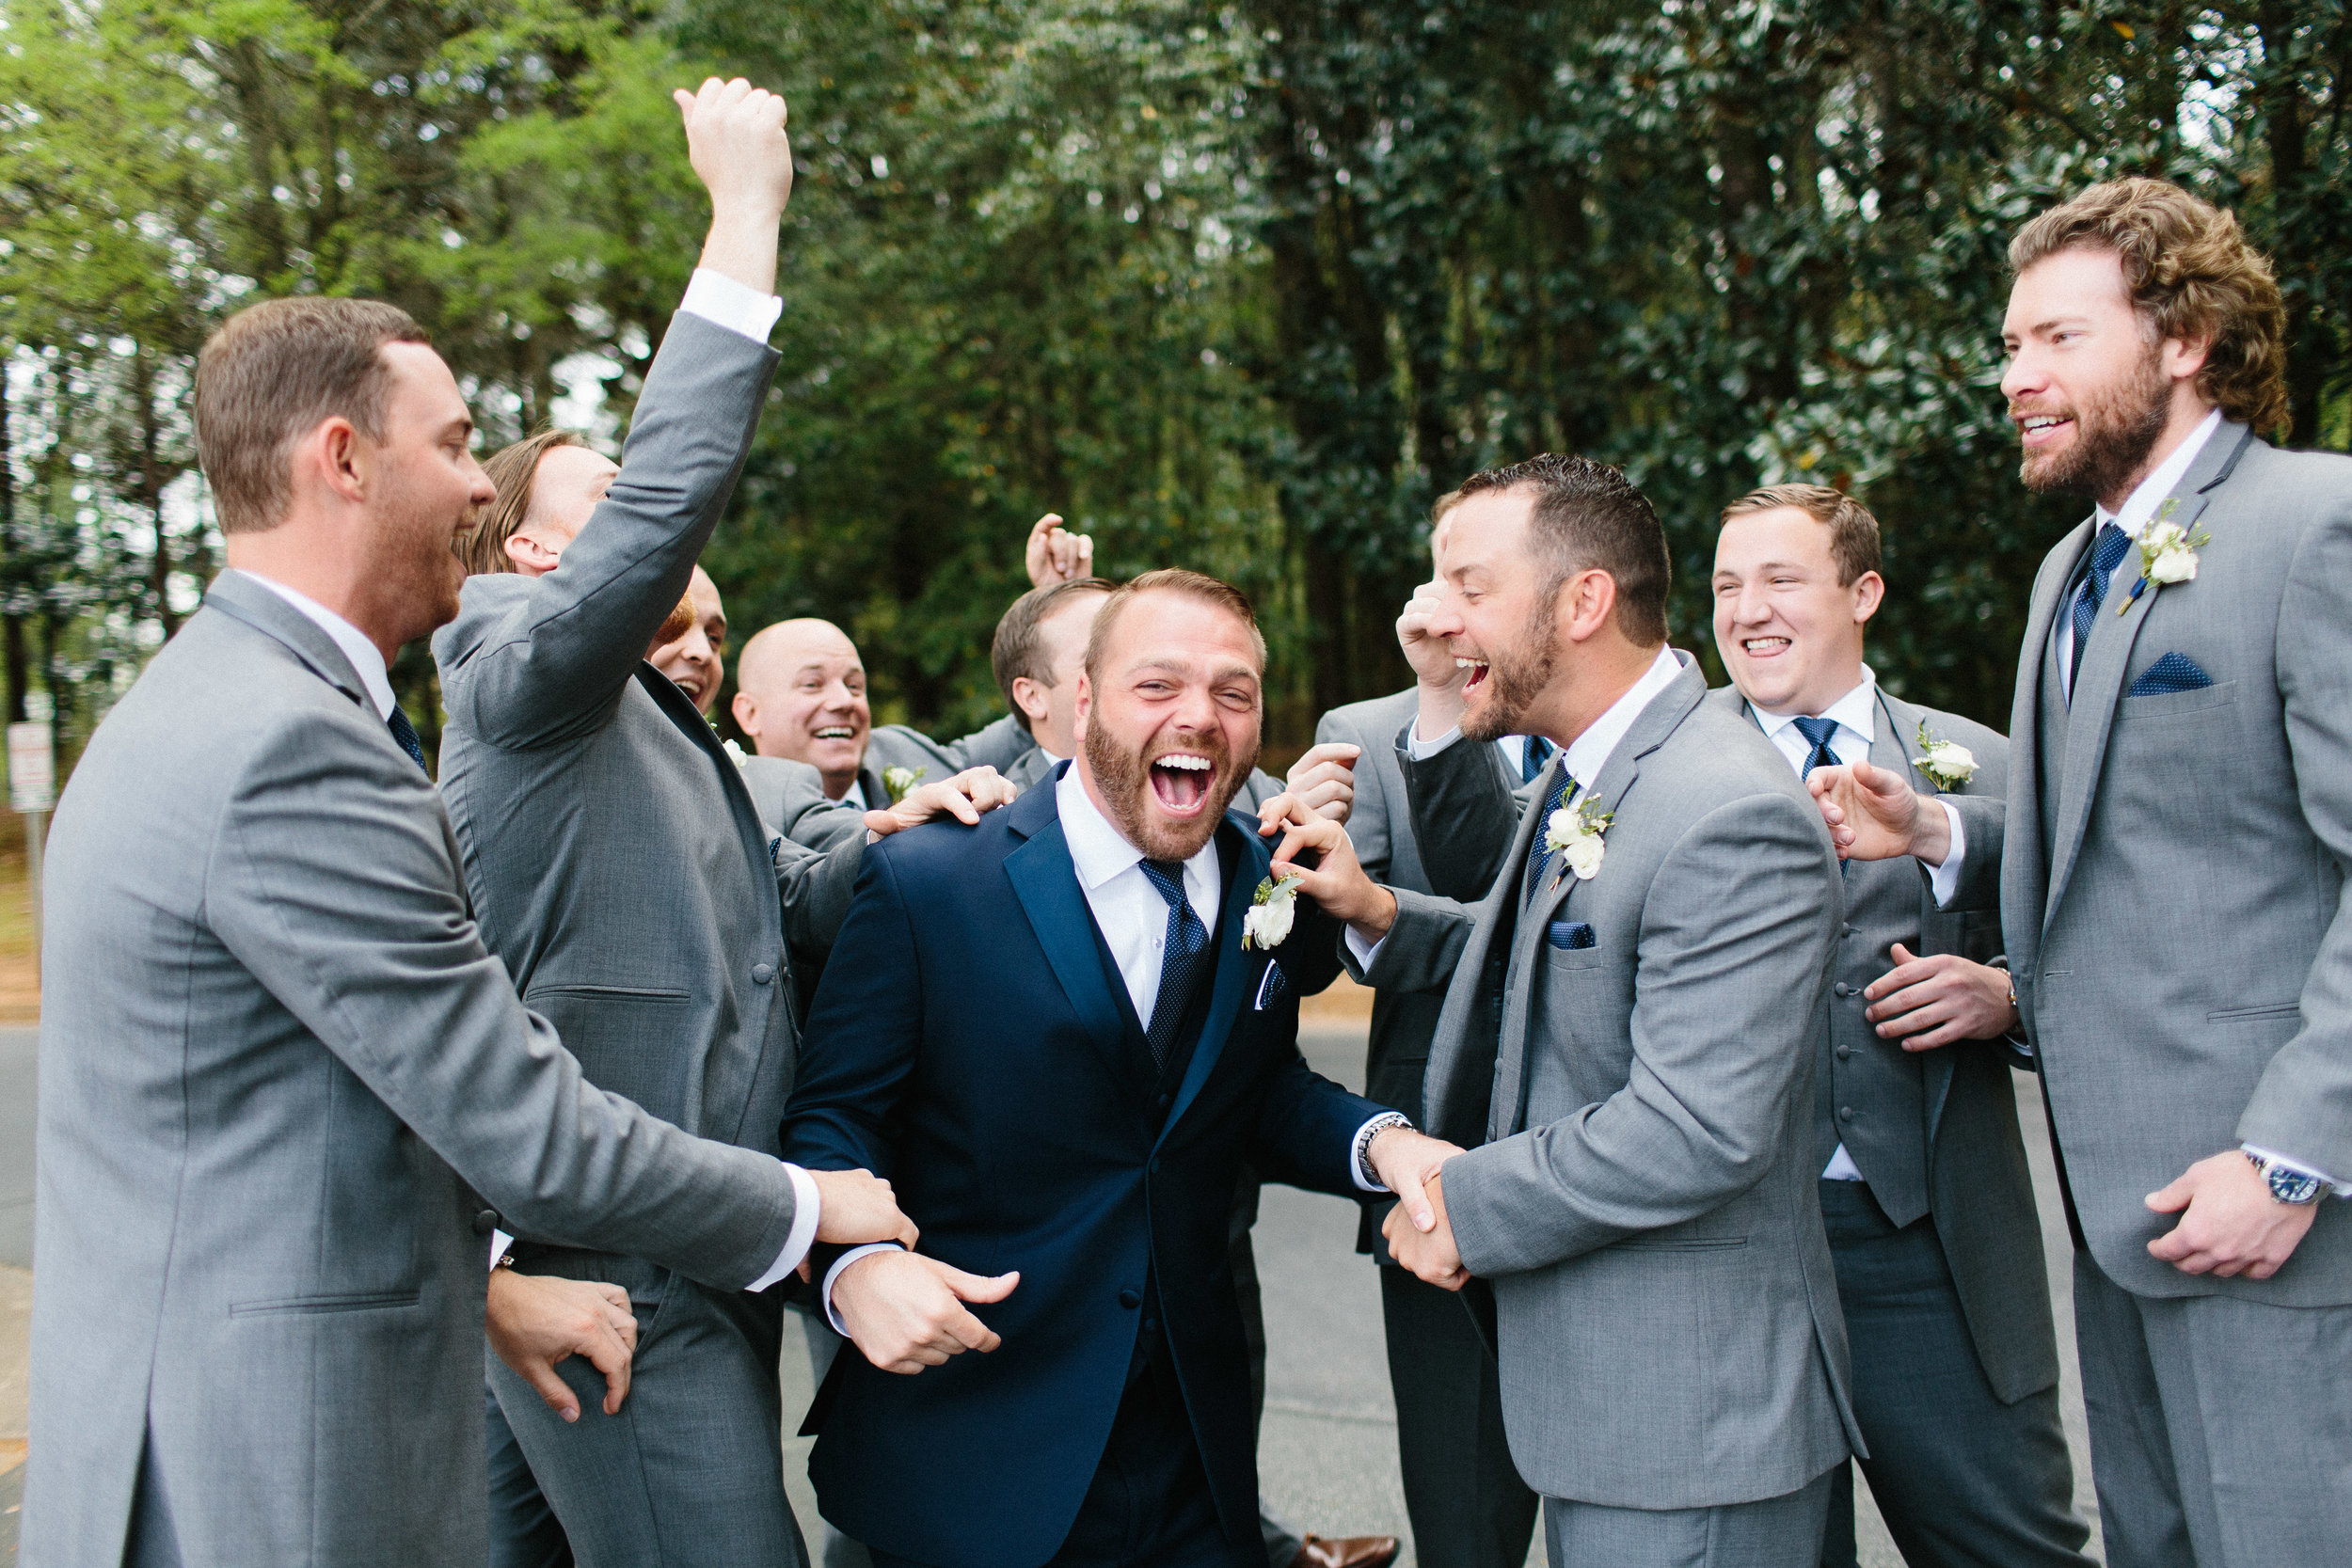 roswell_st_peter_chanel_catholic_avalon_hotel_alpharetta_wedding-1324.jpg